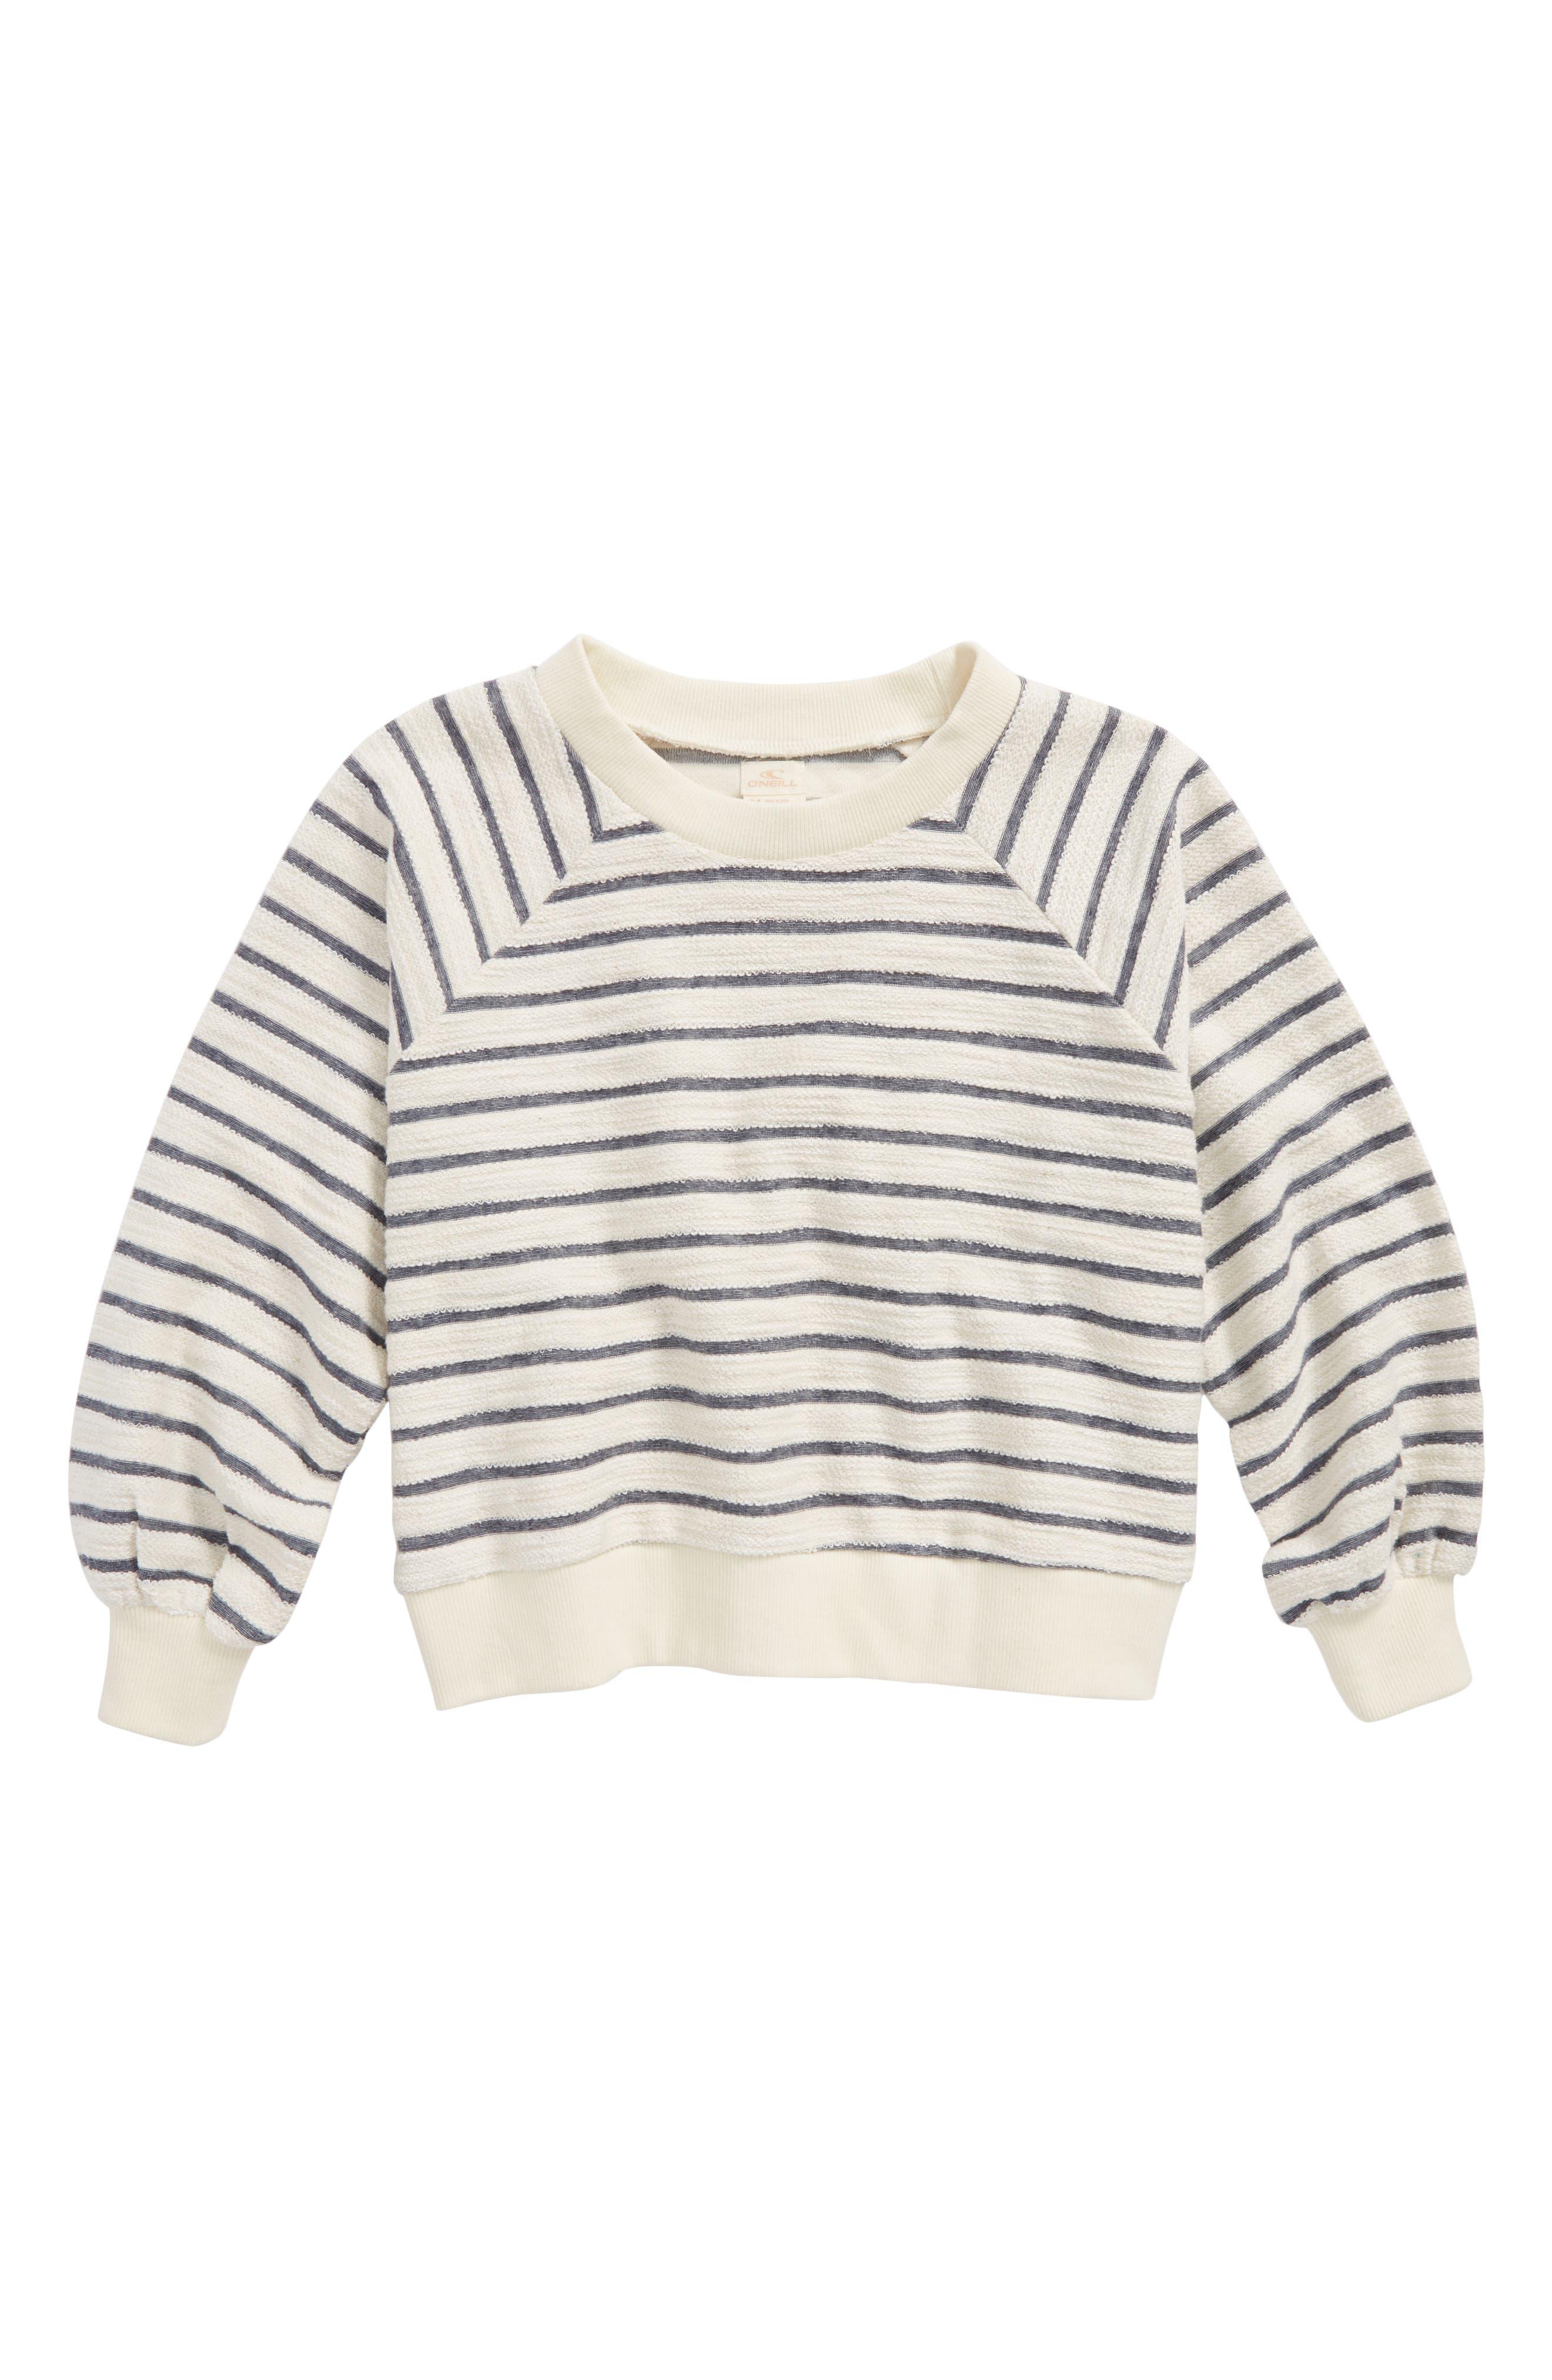 Sleep In Stripe Sweatshirt,                         Main,                         color, WHITE/ BLK STRIPE